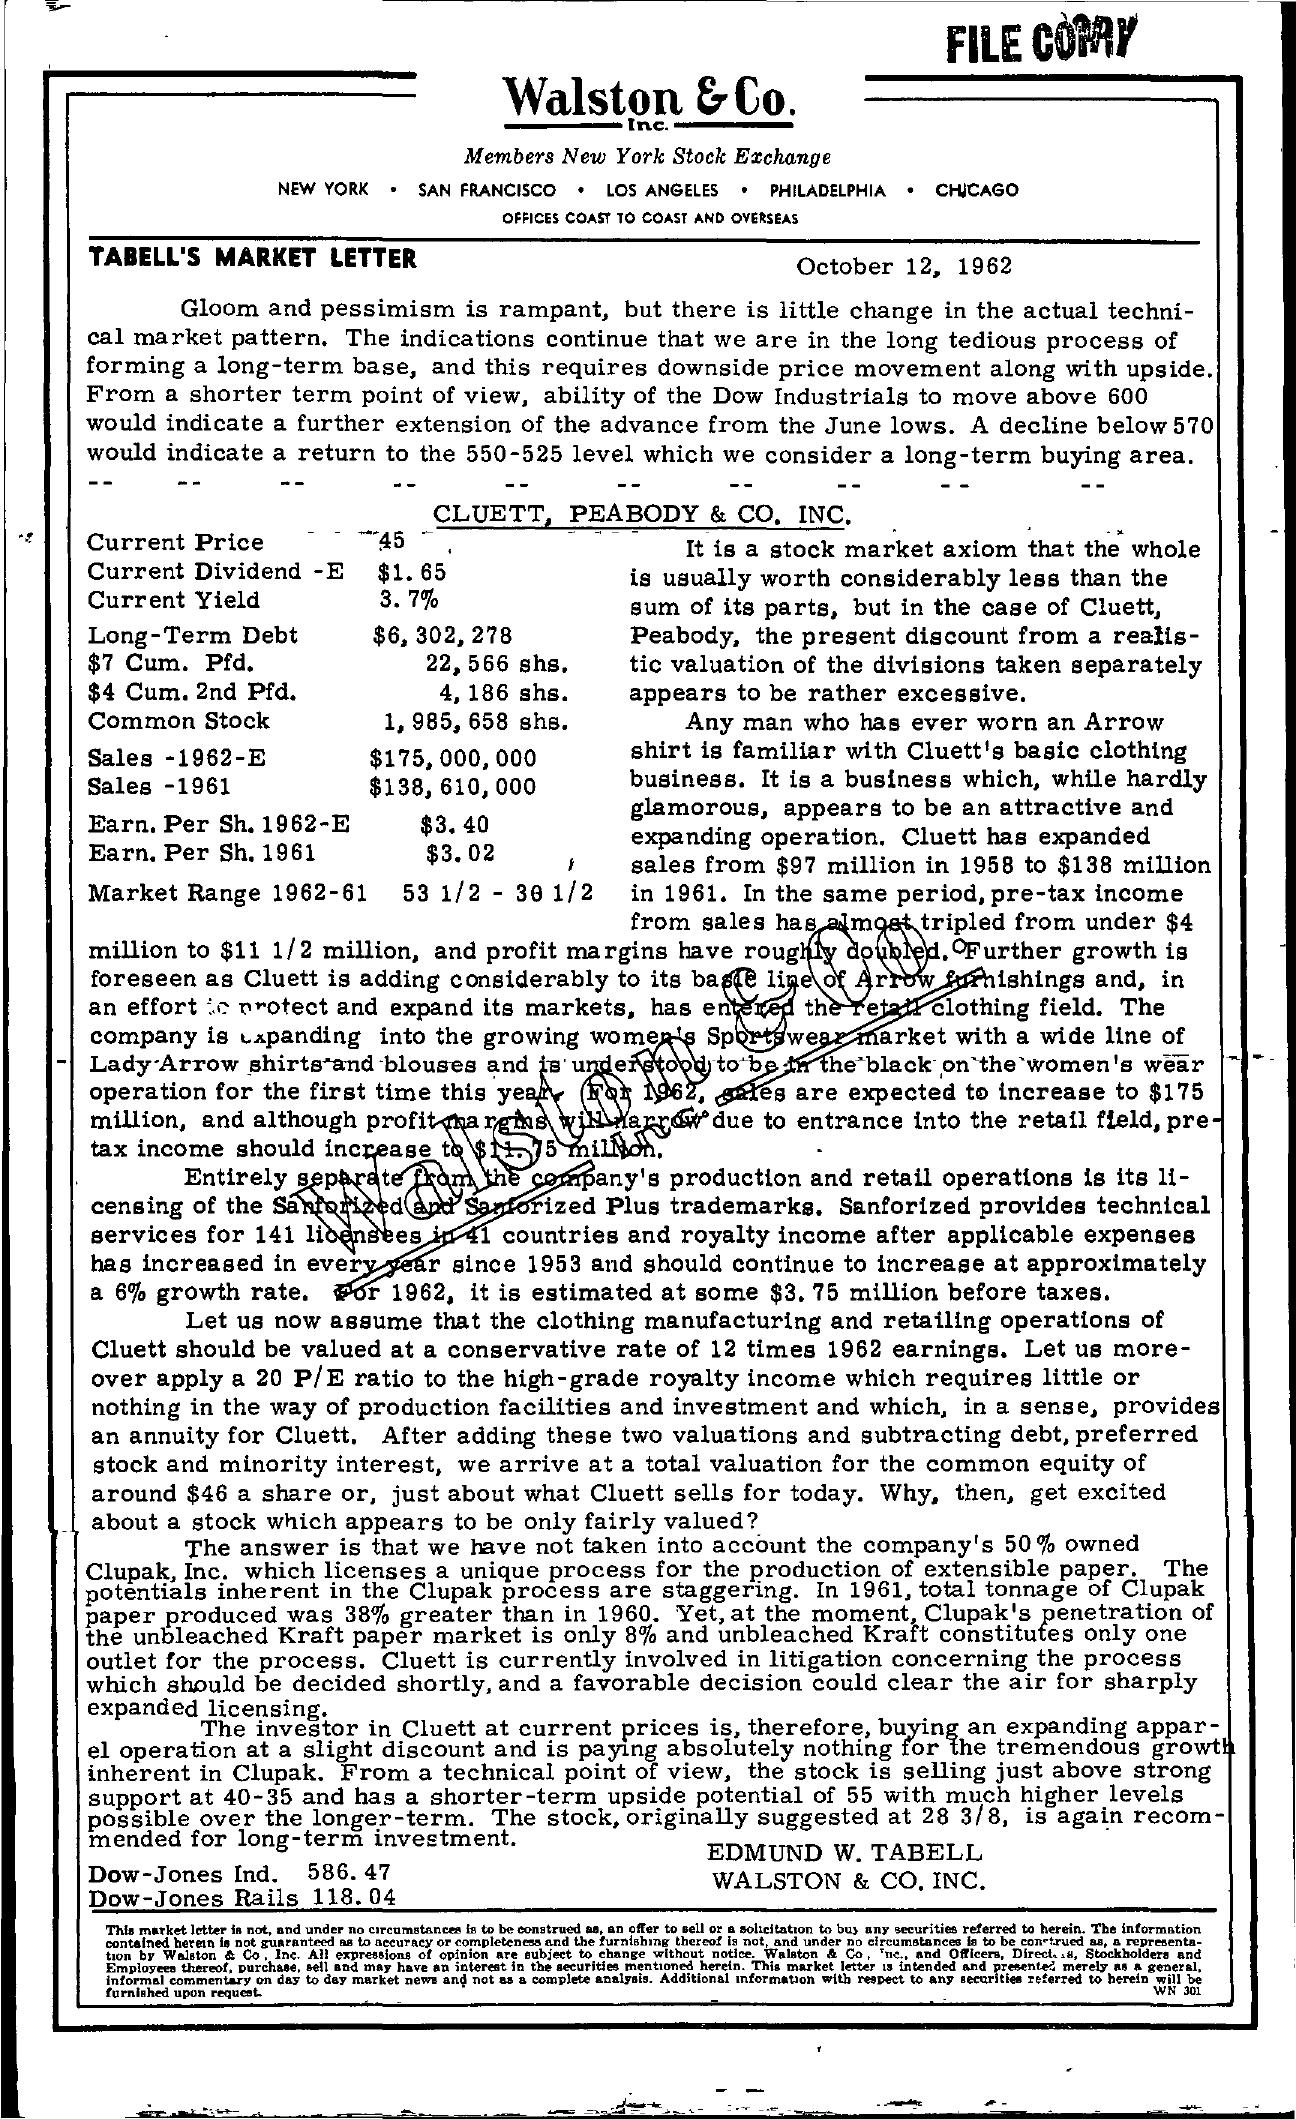 Tabell's Market Letter - October 12, 1962